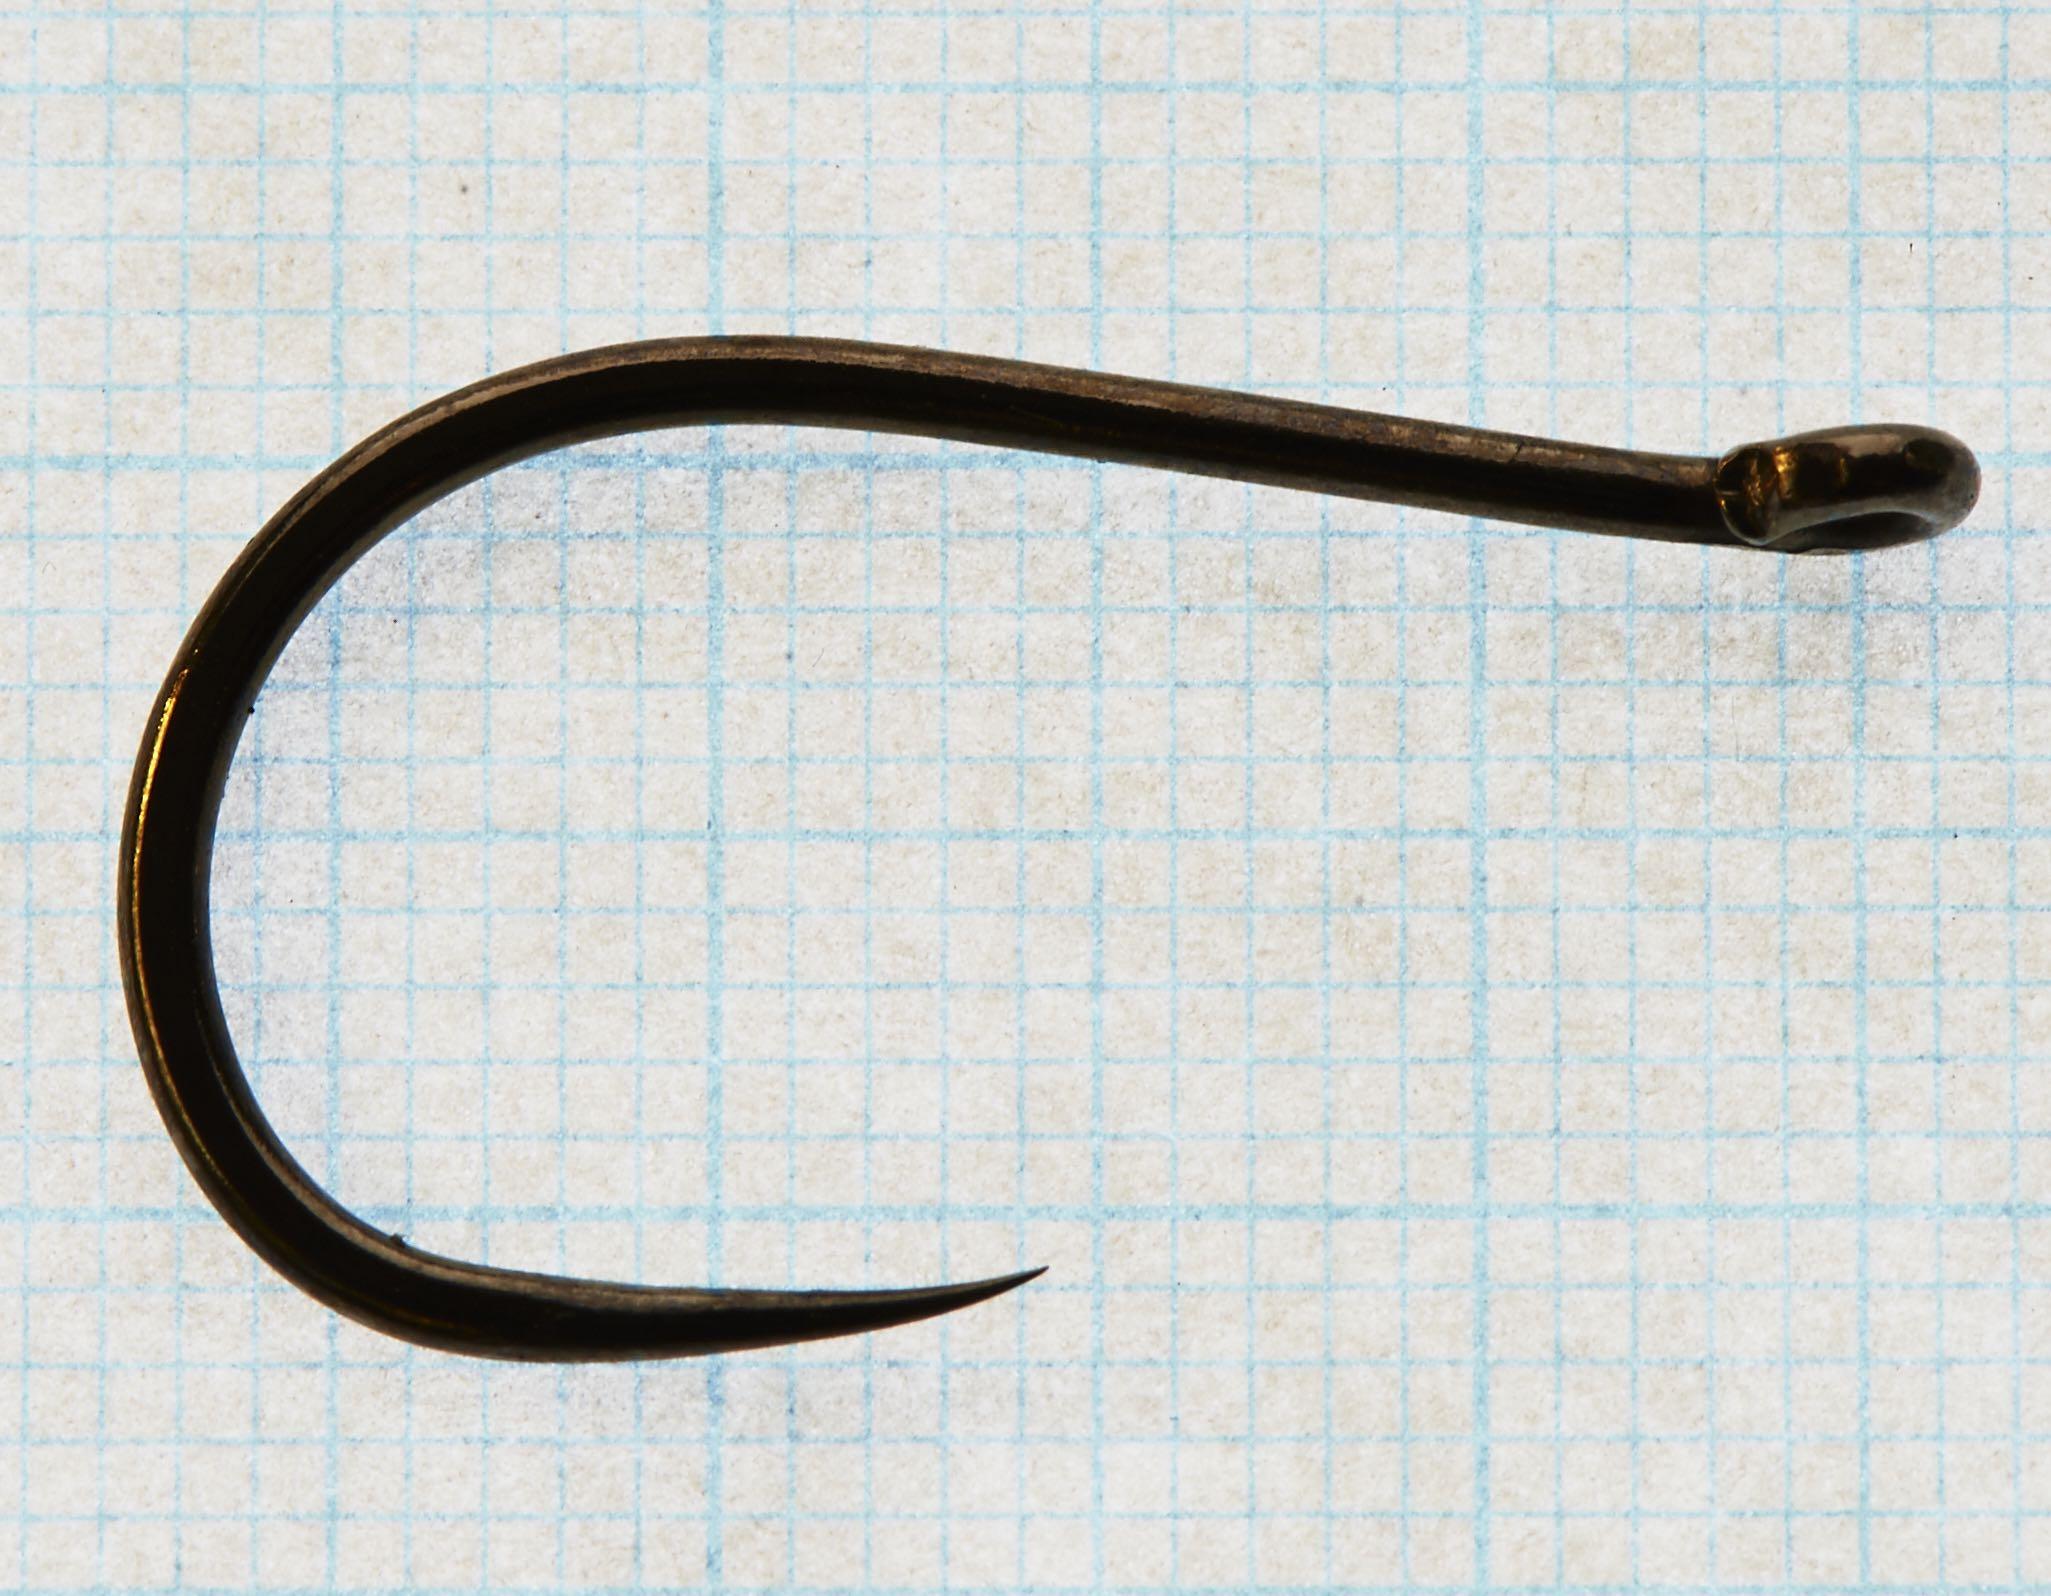 Patriot Barbless Stinger # 1 Partridge tube fly hook